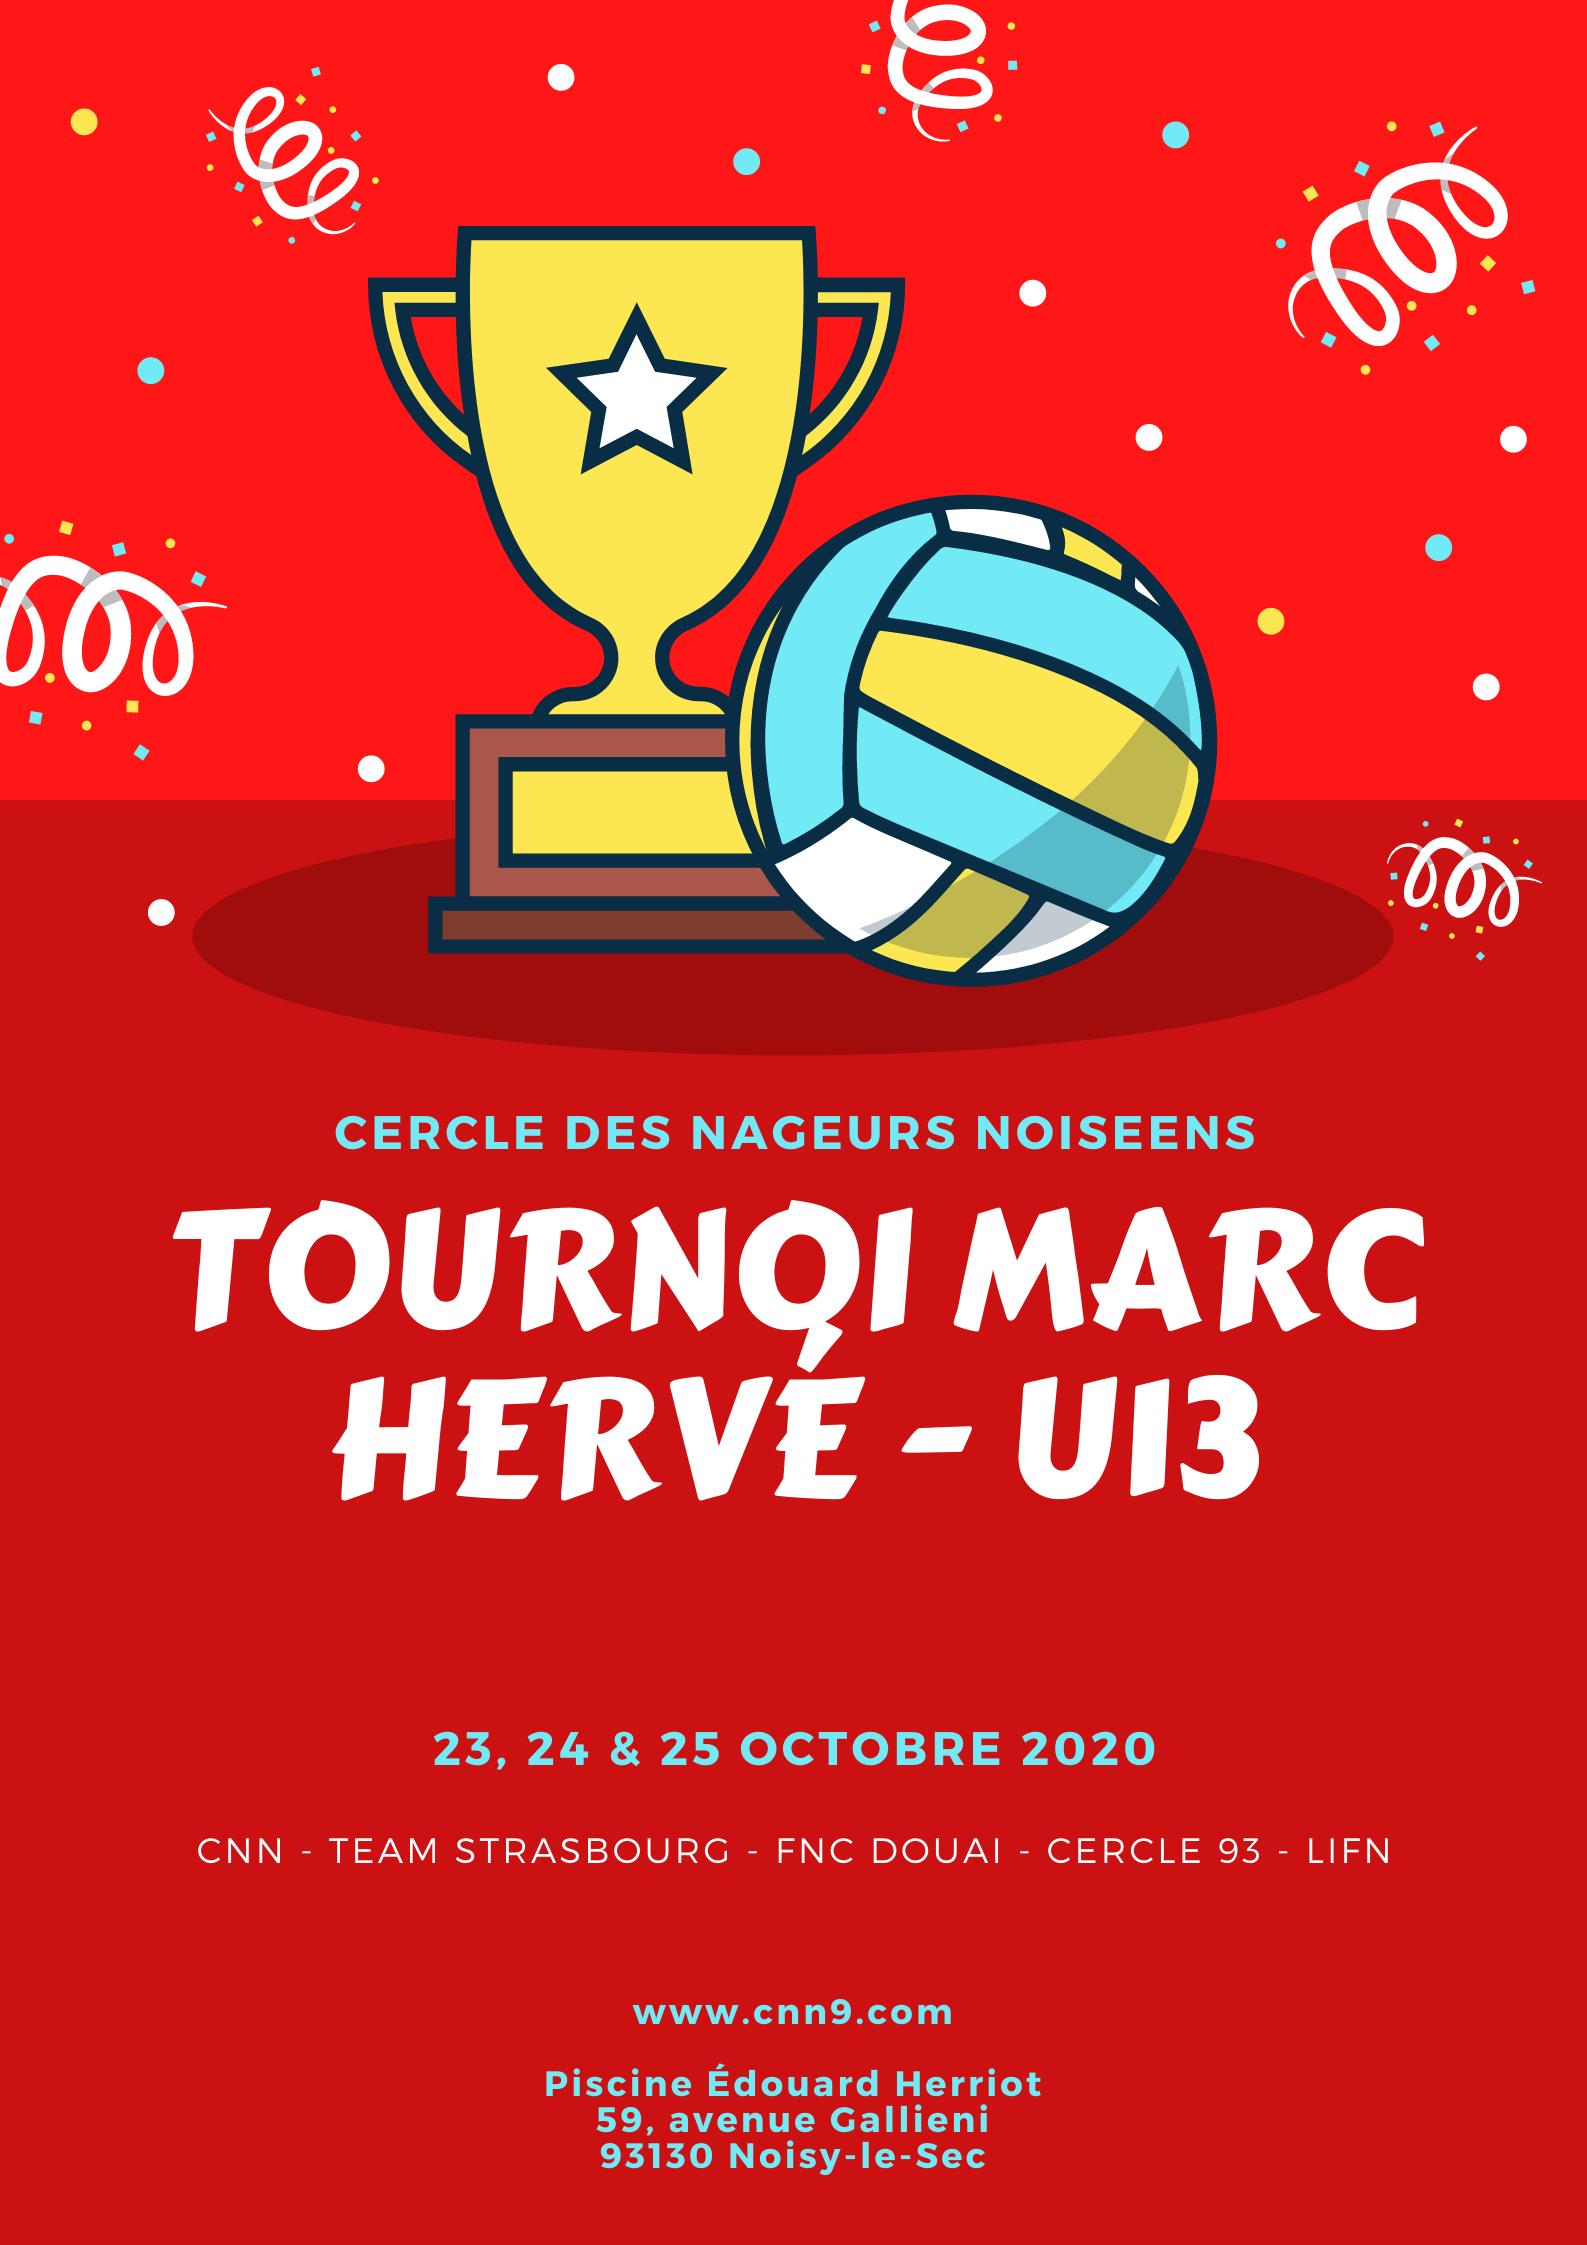 TOURNOI MARC HERVÉ - U13